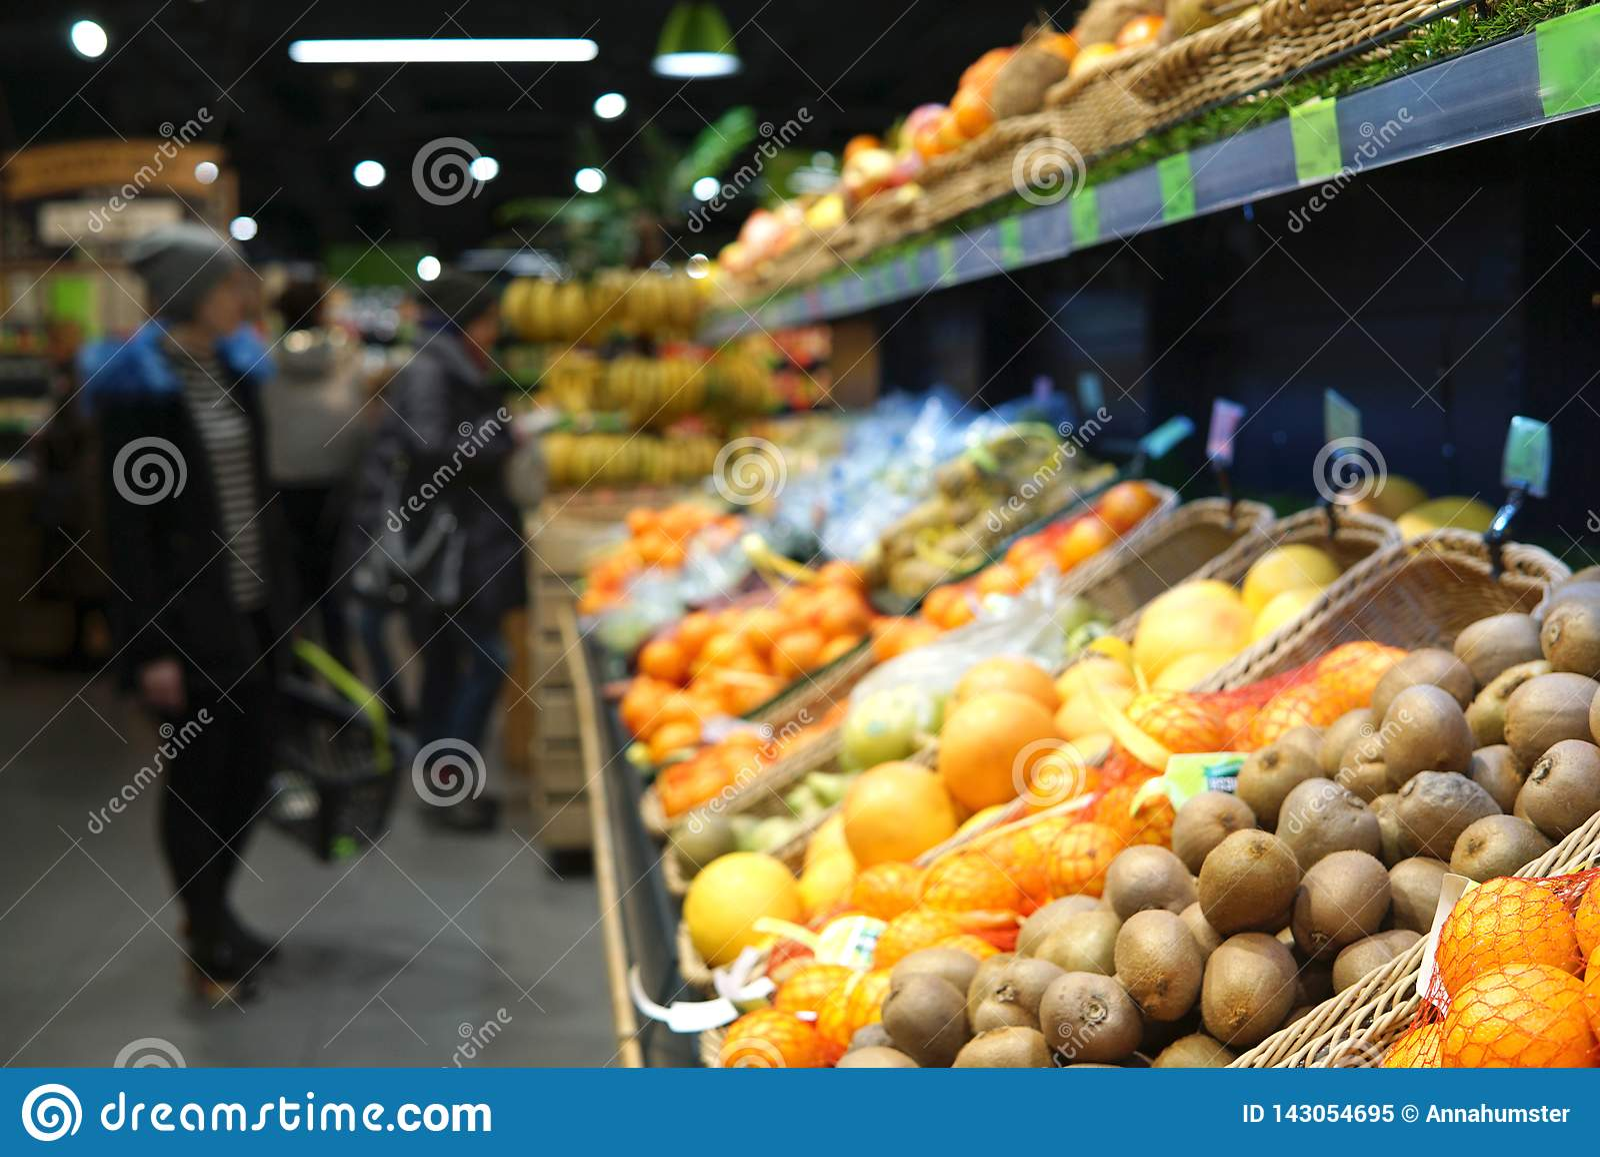 Frukter Suddig bild av supermarket